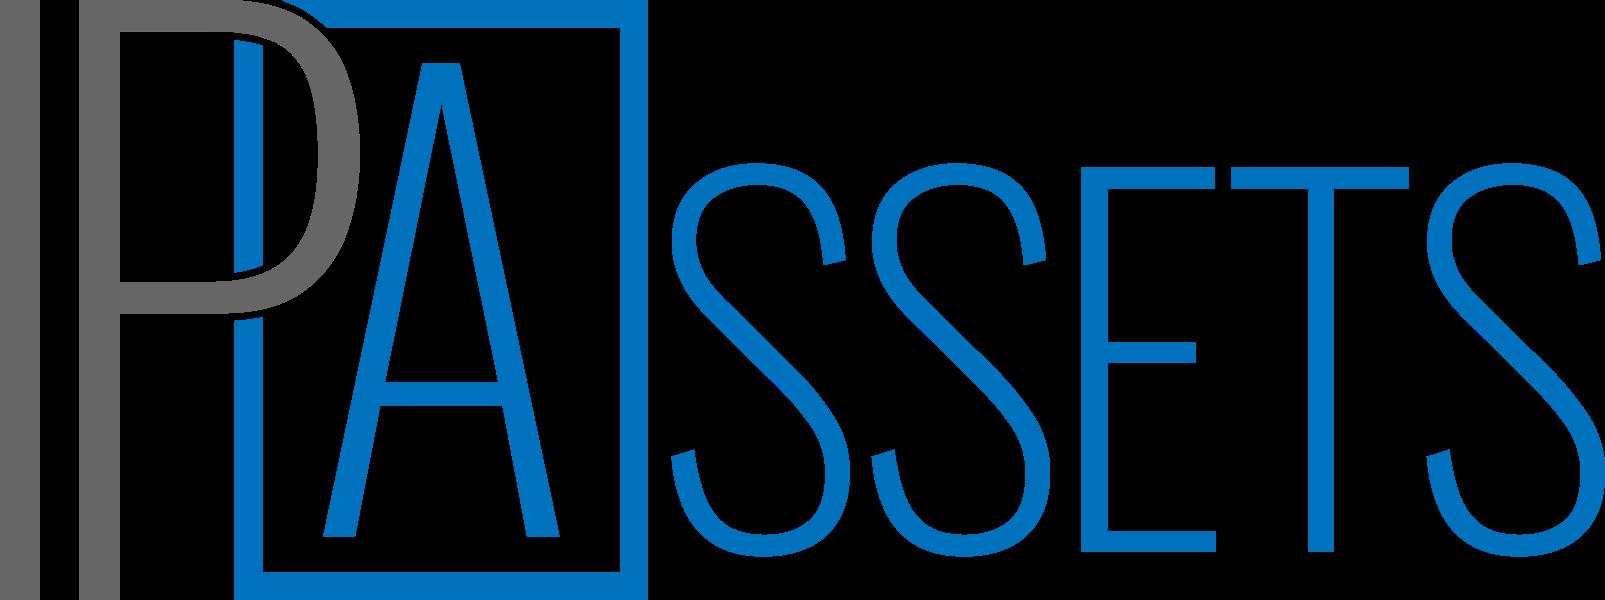 IPAssets logo